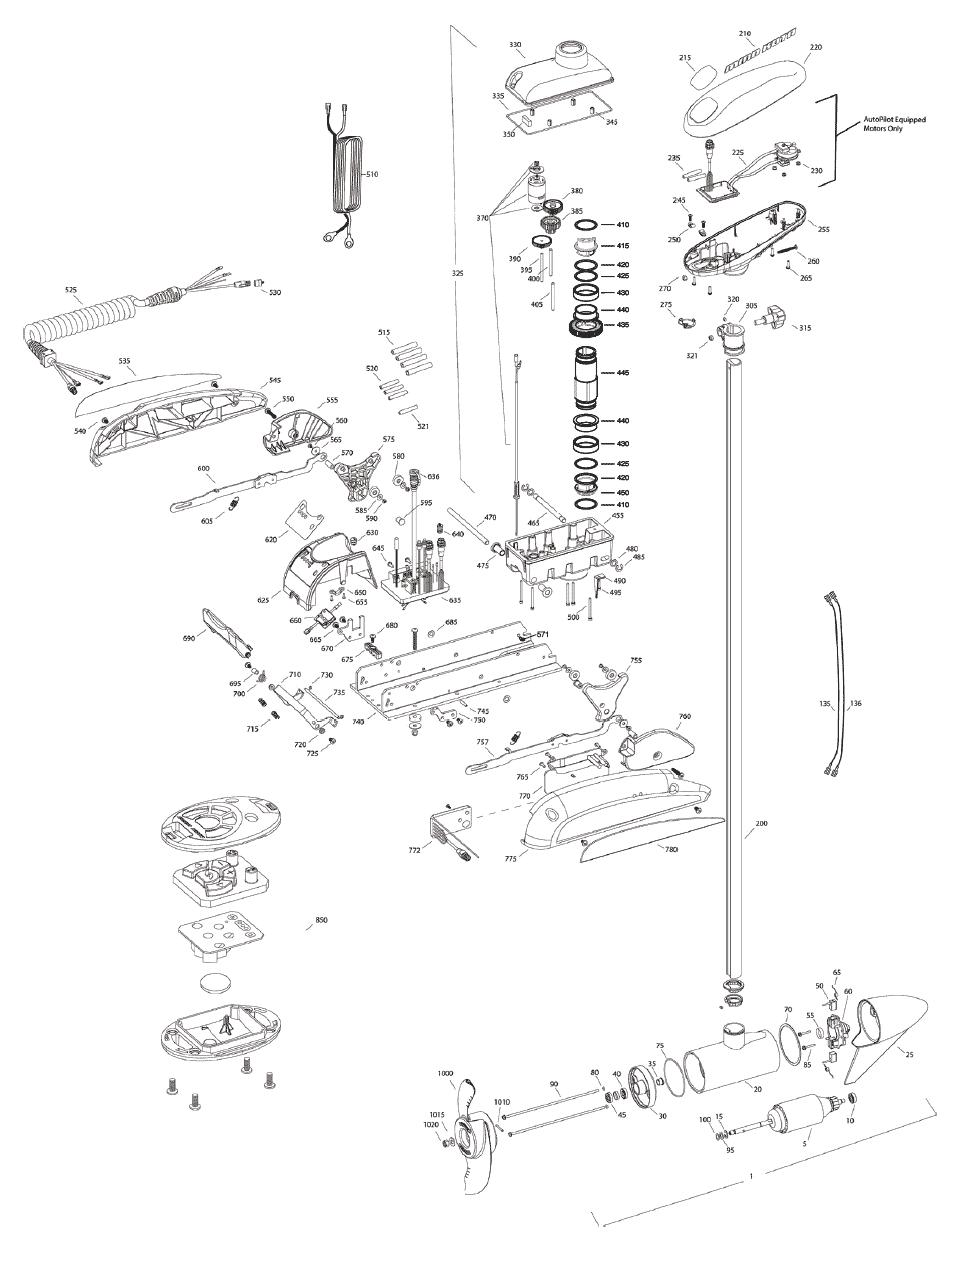 Riptide Minn Kota Wiring Diagram Trusted Diagrams Maxxum 80 Somurich Com